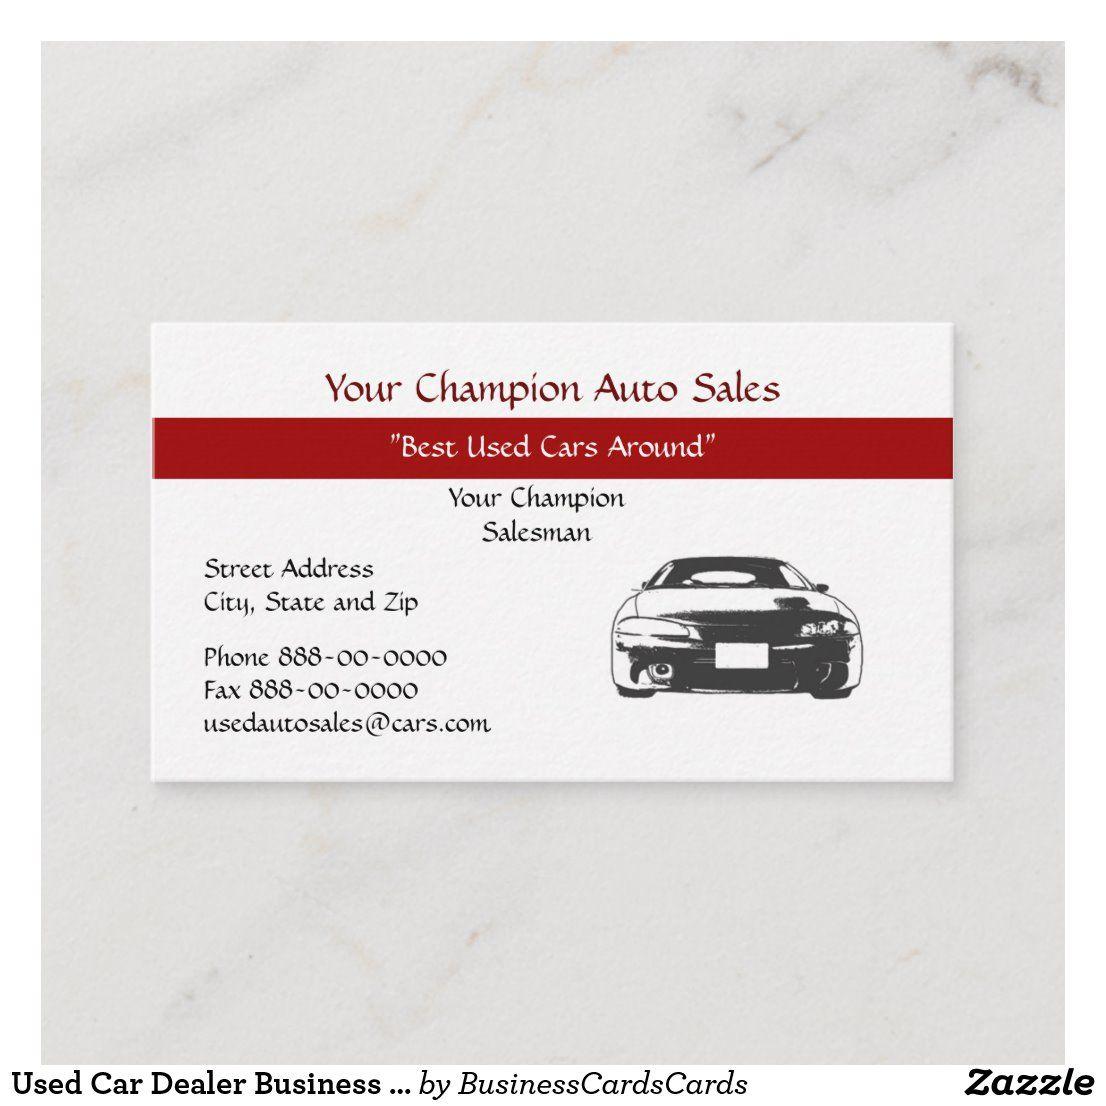 Used Car Dealer Business Card Zazzle Com Used Car Dealer Car Dealer Illustration Business Cards